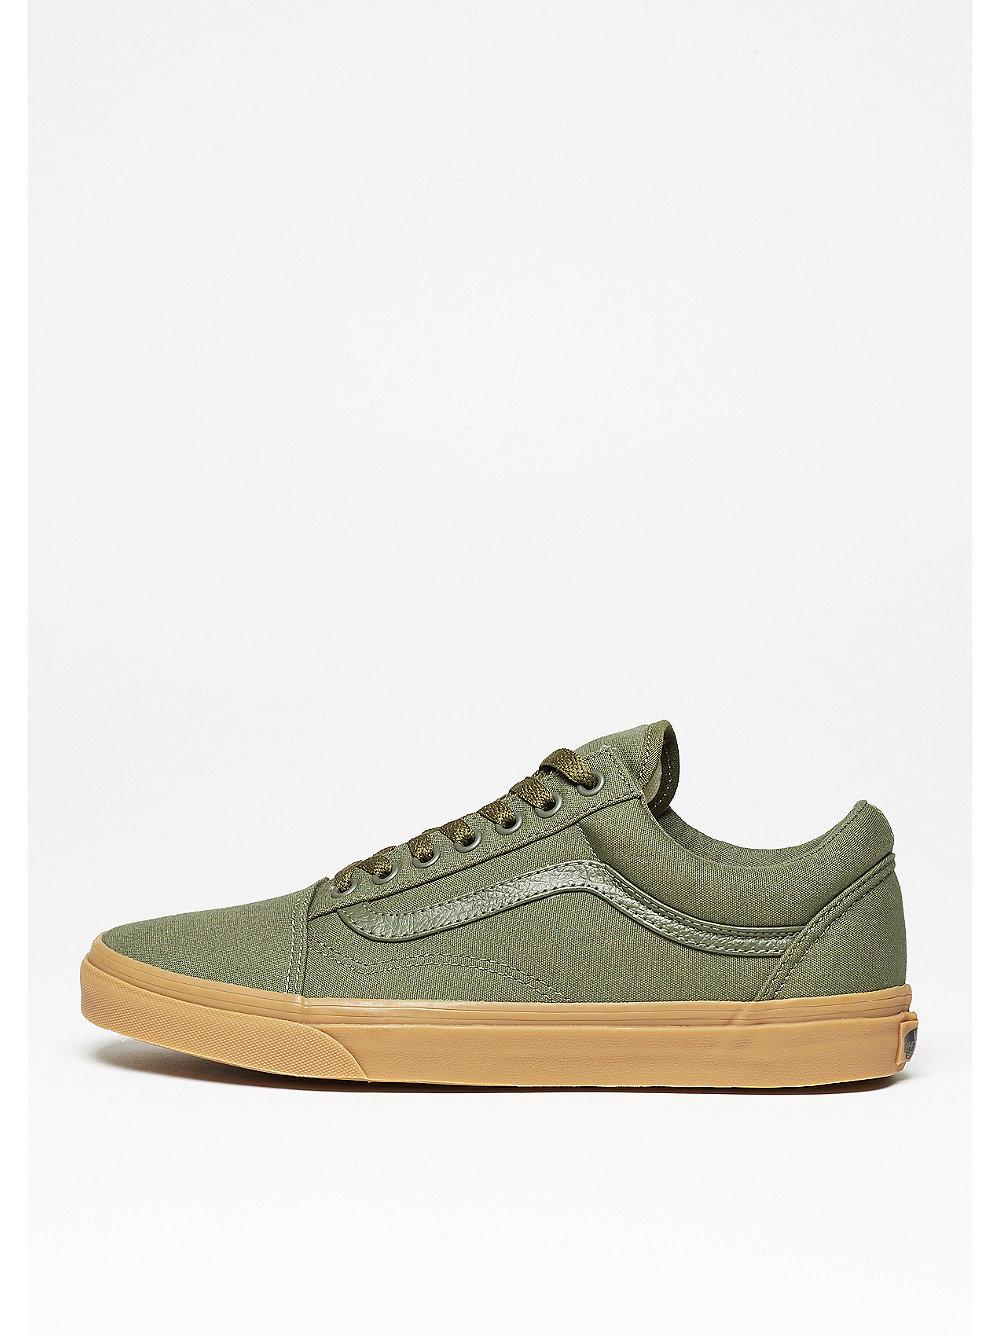 Harga Jual Sepatu Vans Old Skool High